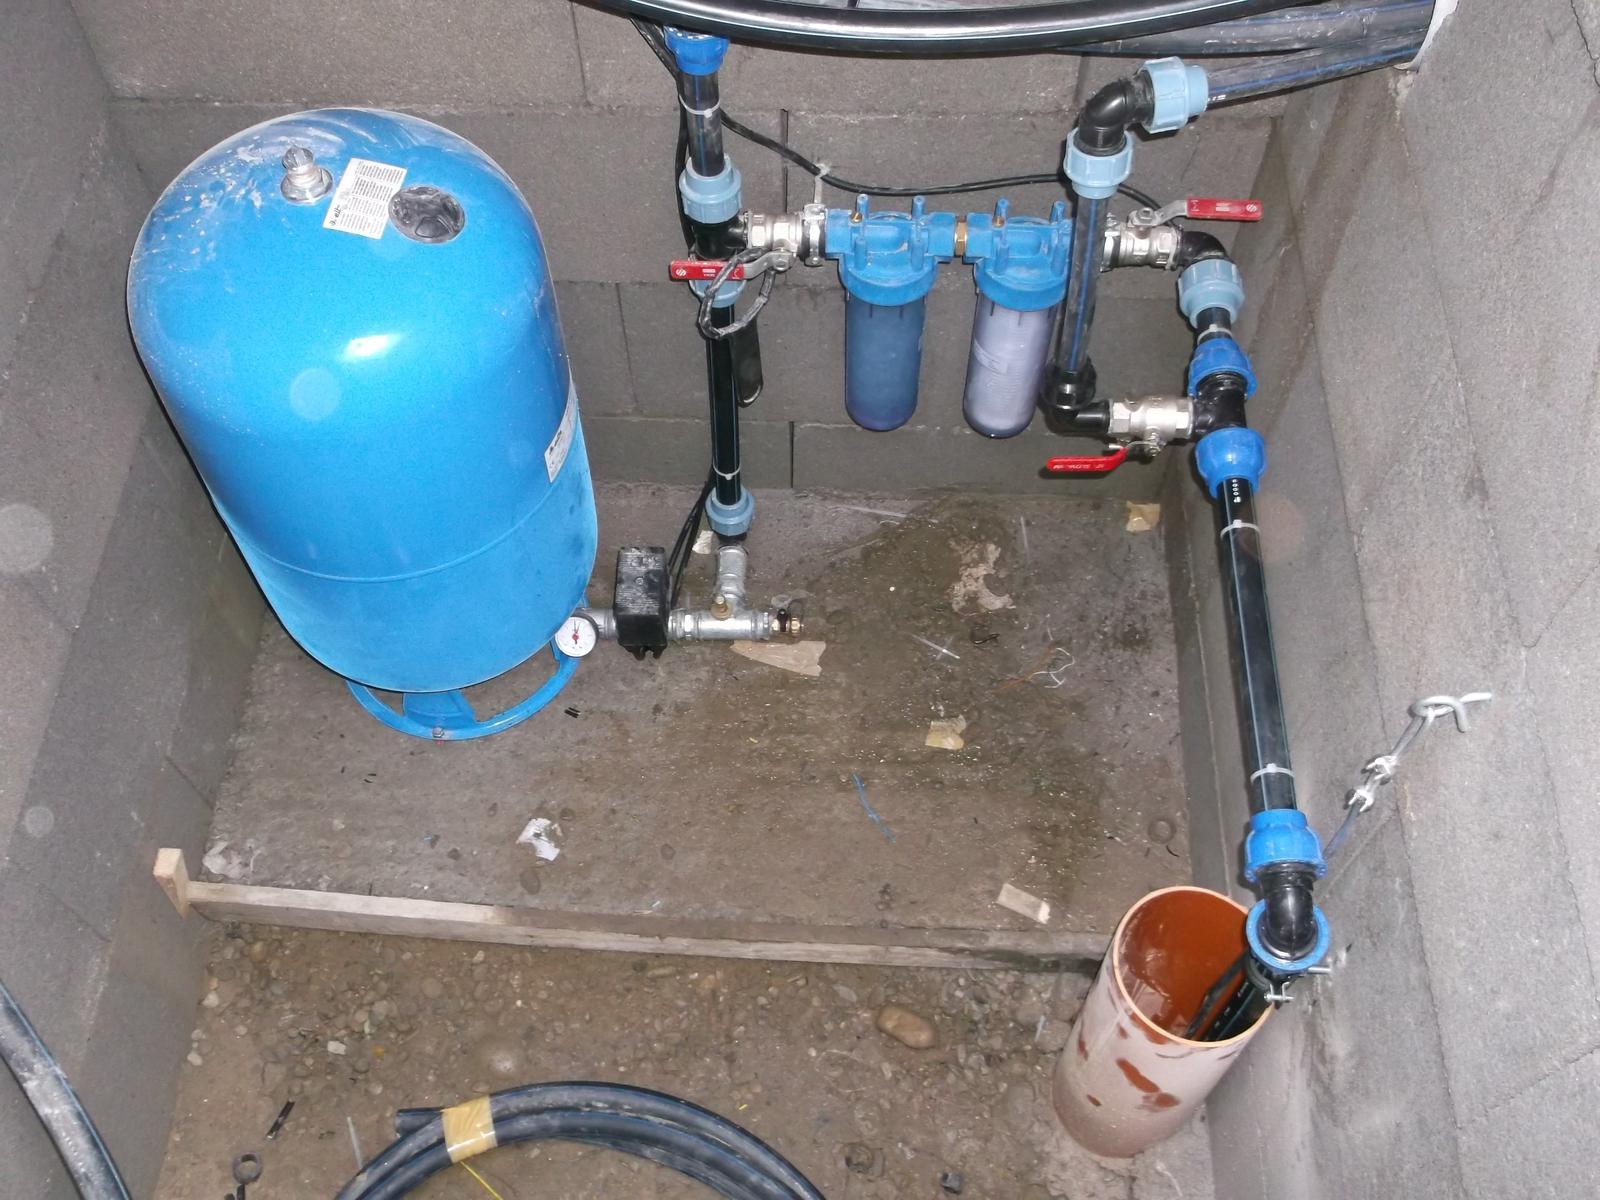 Pokracovanie stavby april-maj 2015 - Tak a voda uz fachci